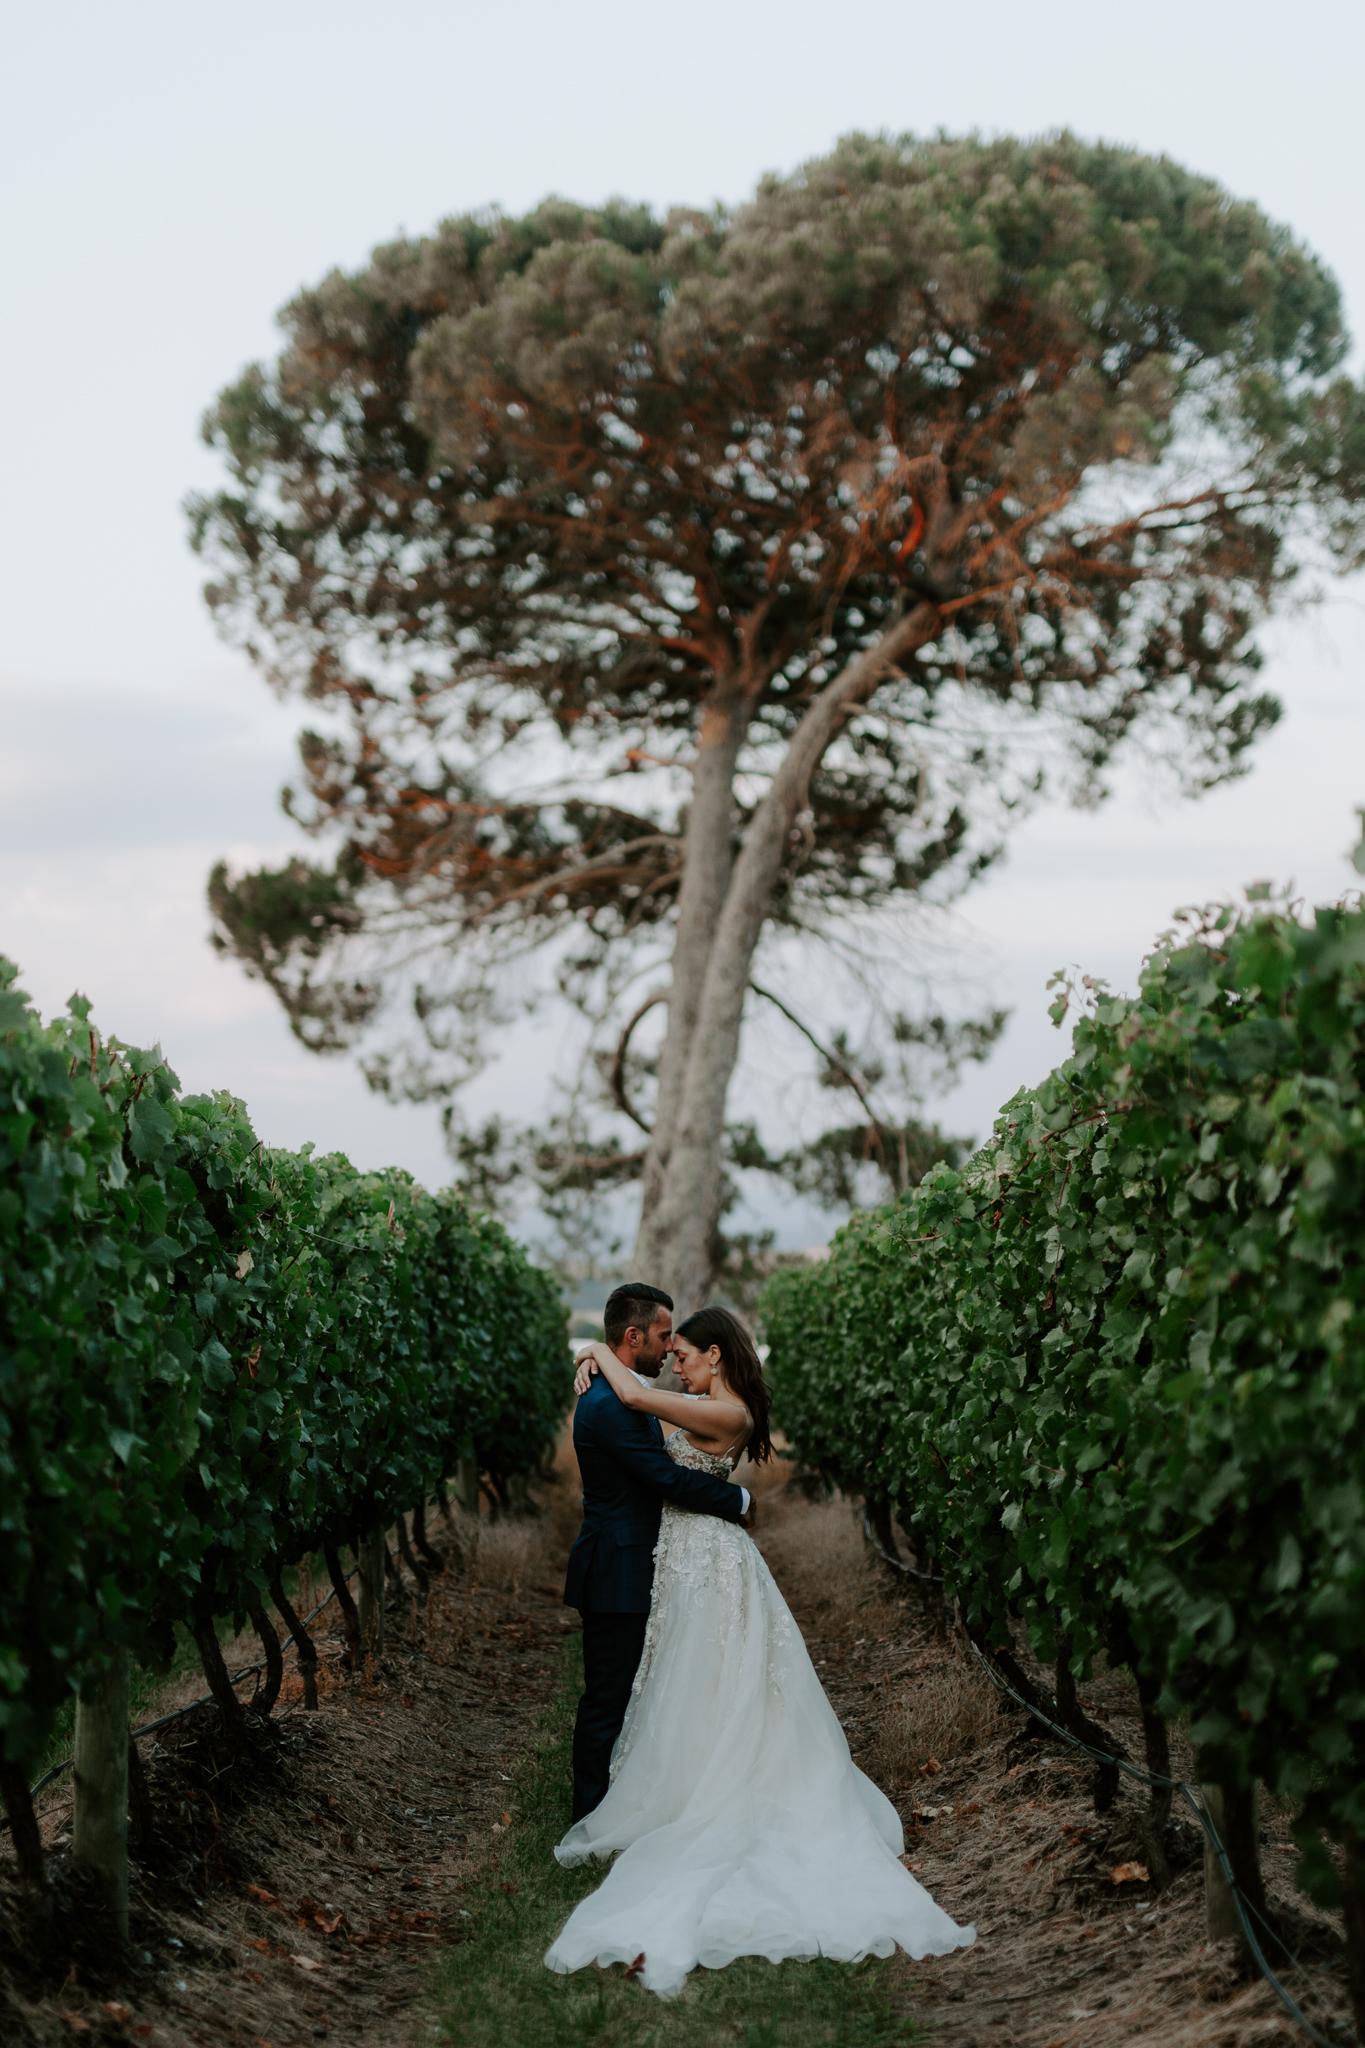 The-Stones-of-Yarra-Valley-Wedding-EmotionsandMathPhotography-233.jpg